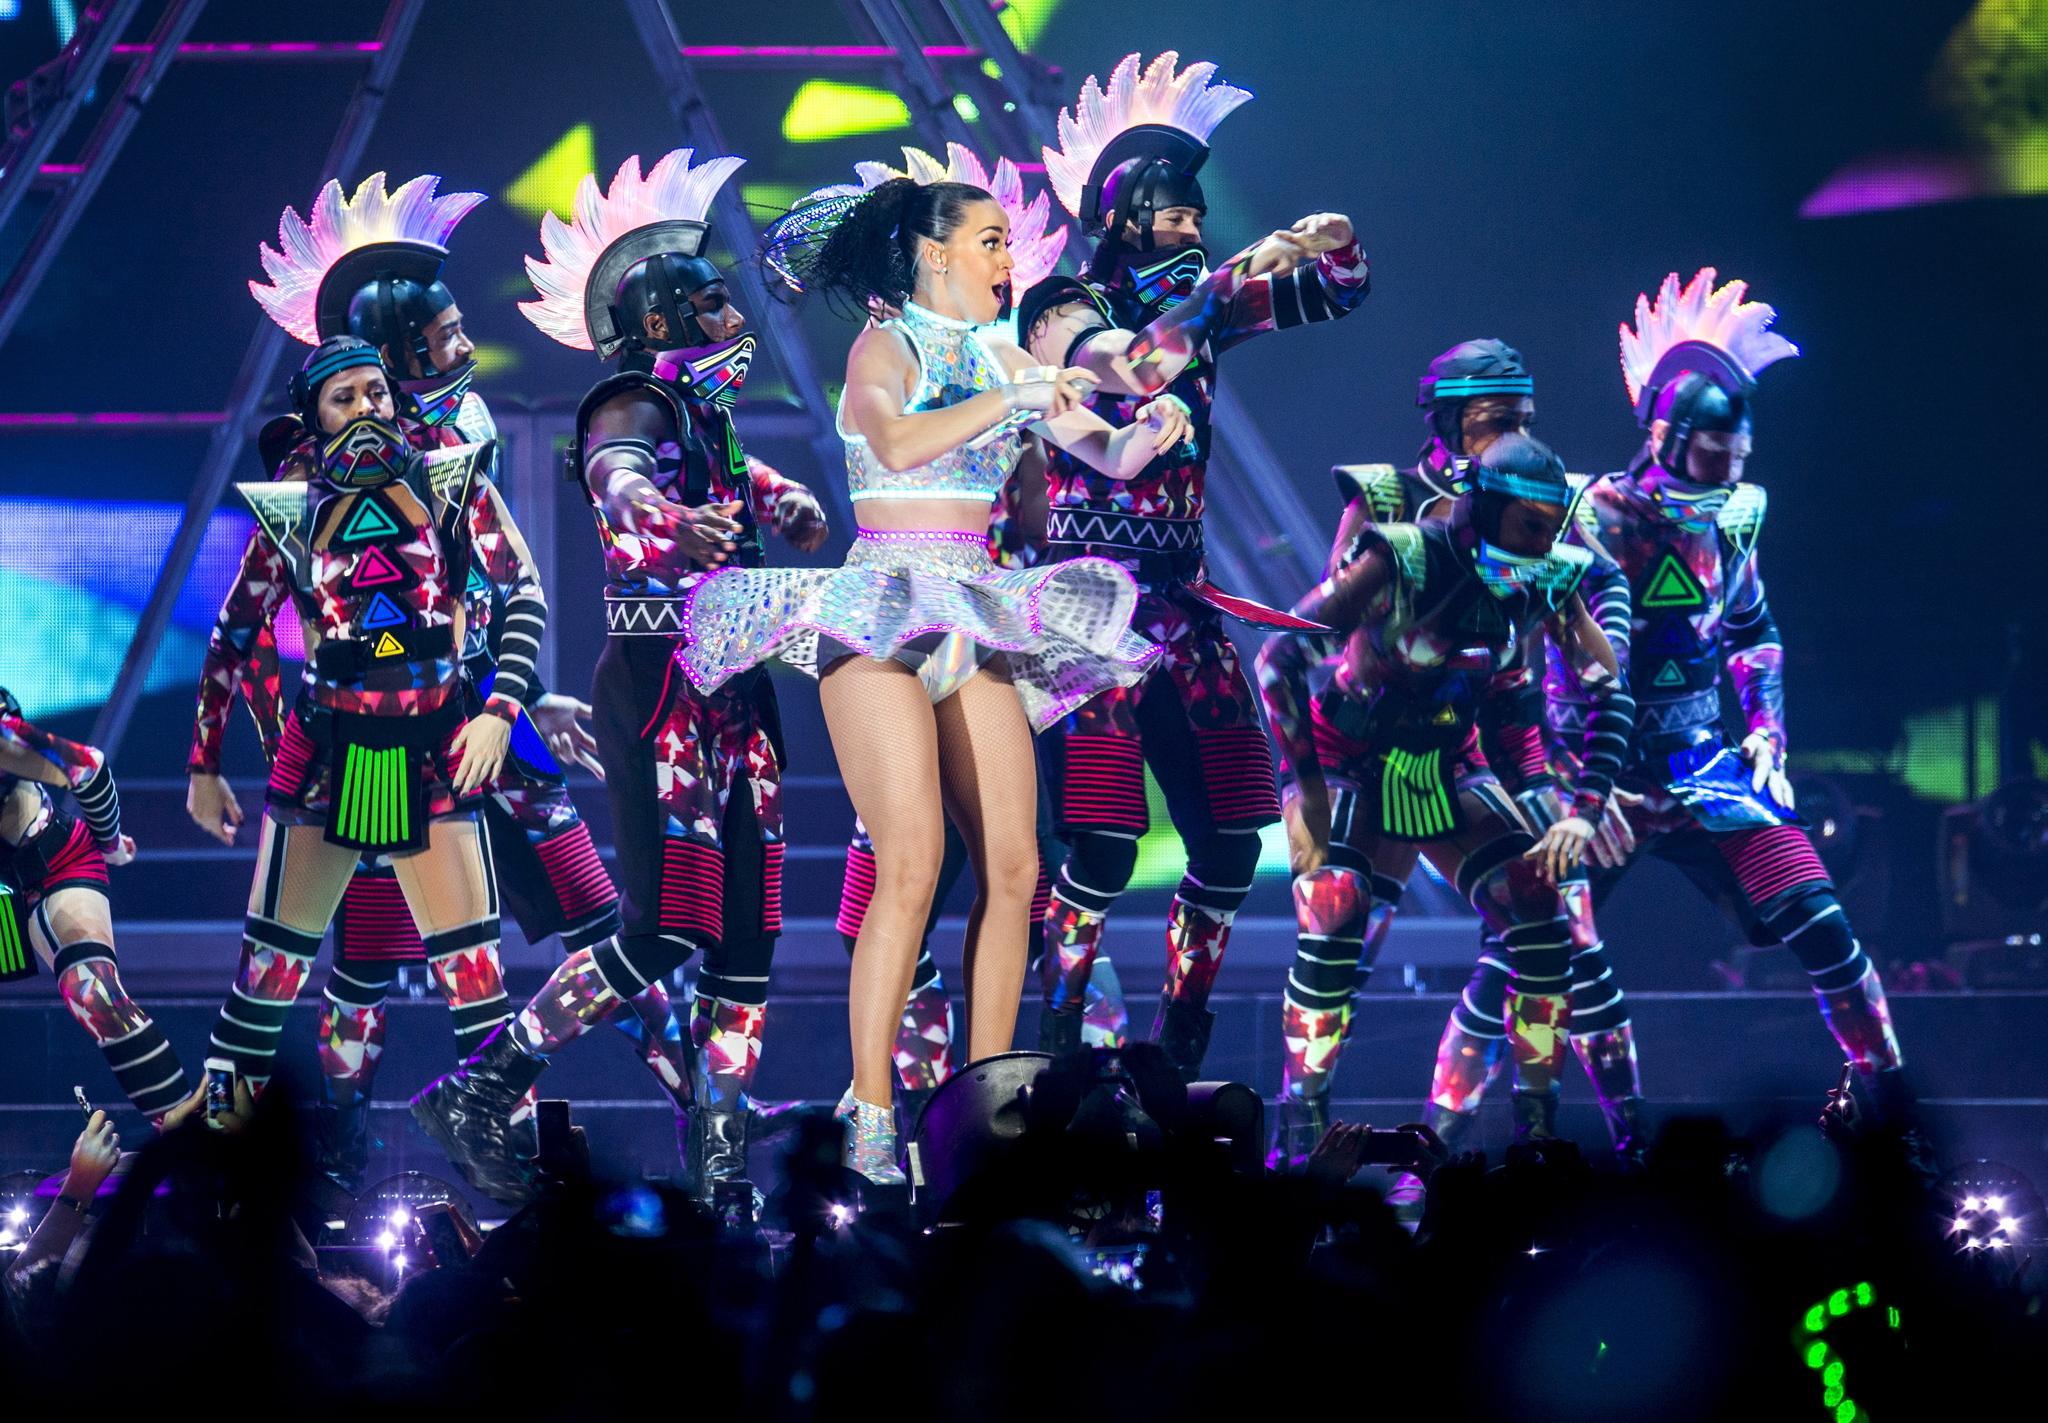 Konsert: Katy Perry – «Prismatic World Tour» – VG